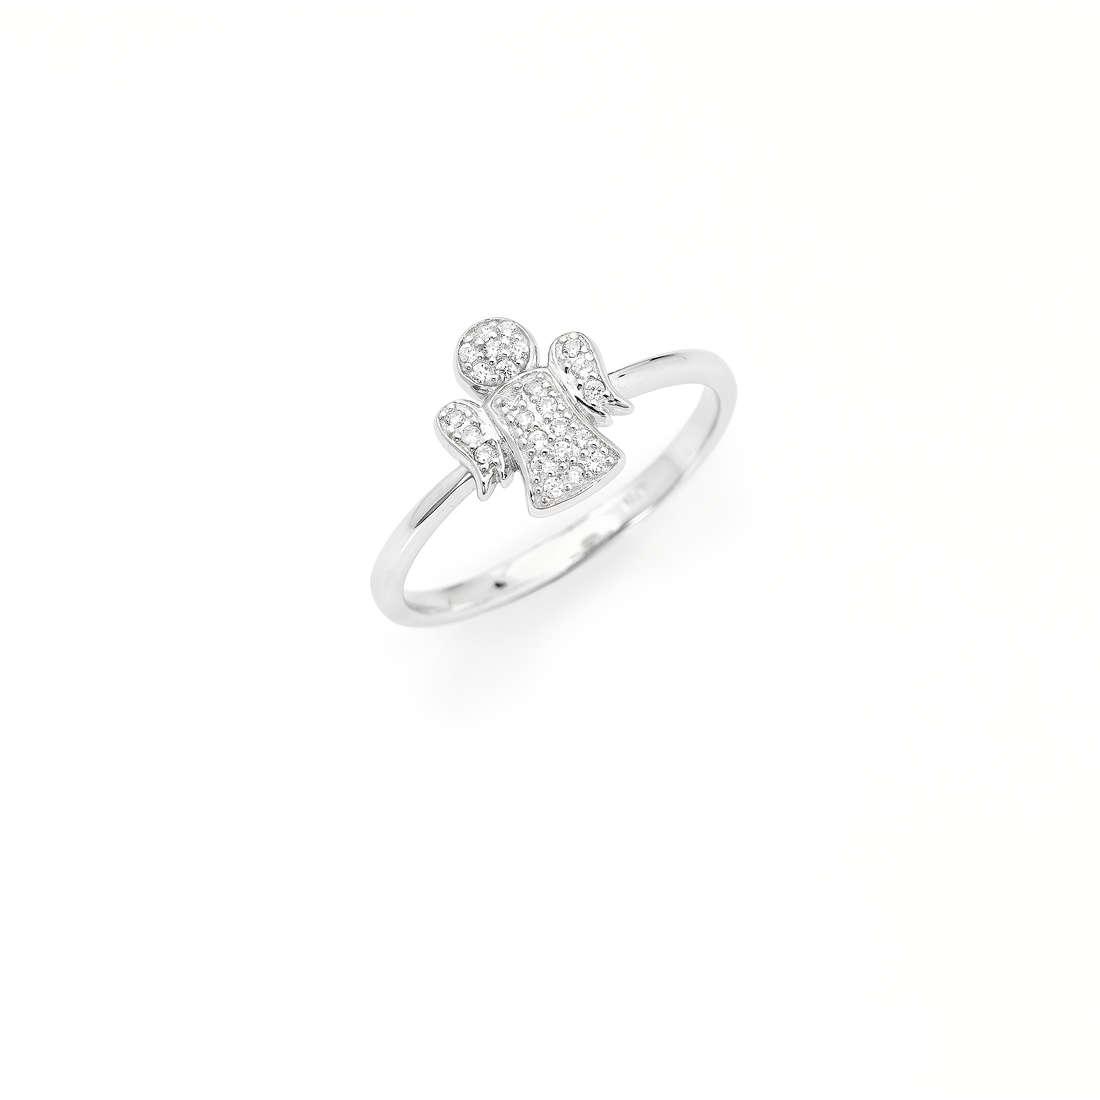 ring unisex jewellery Amen Angeli RA-14